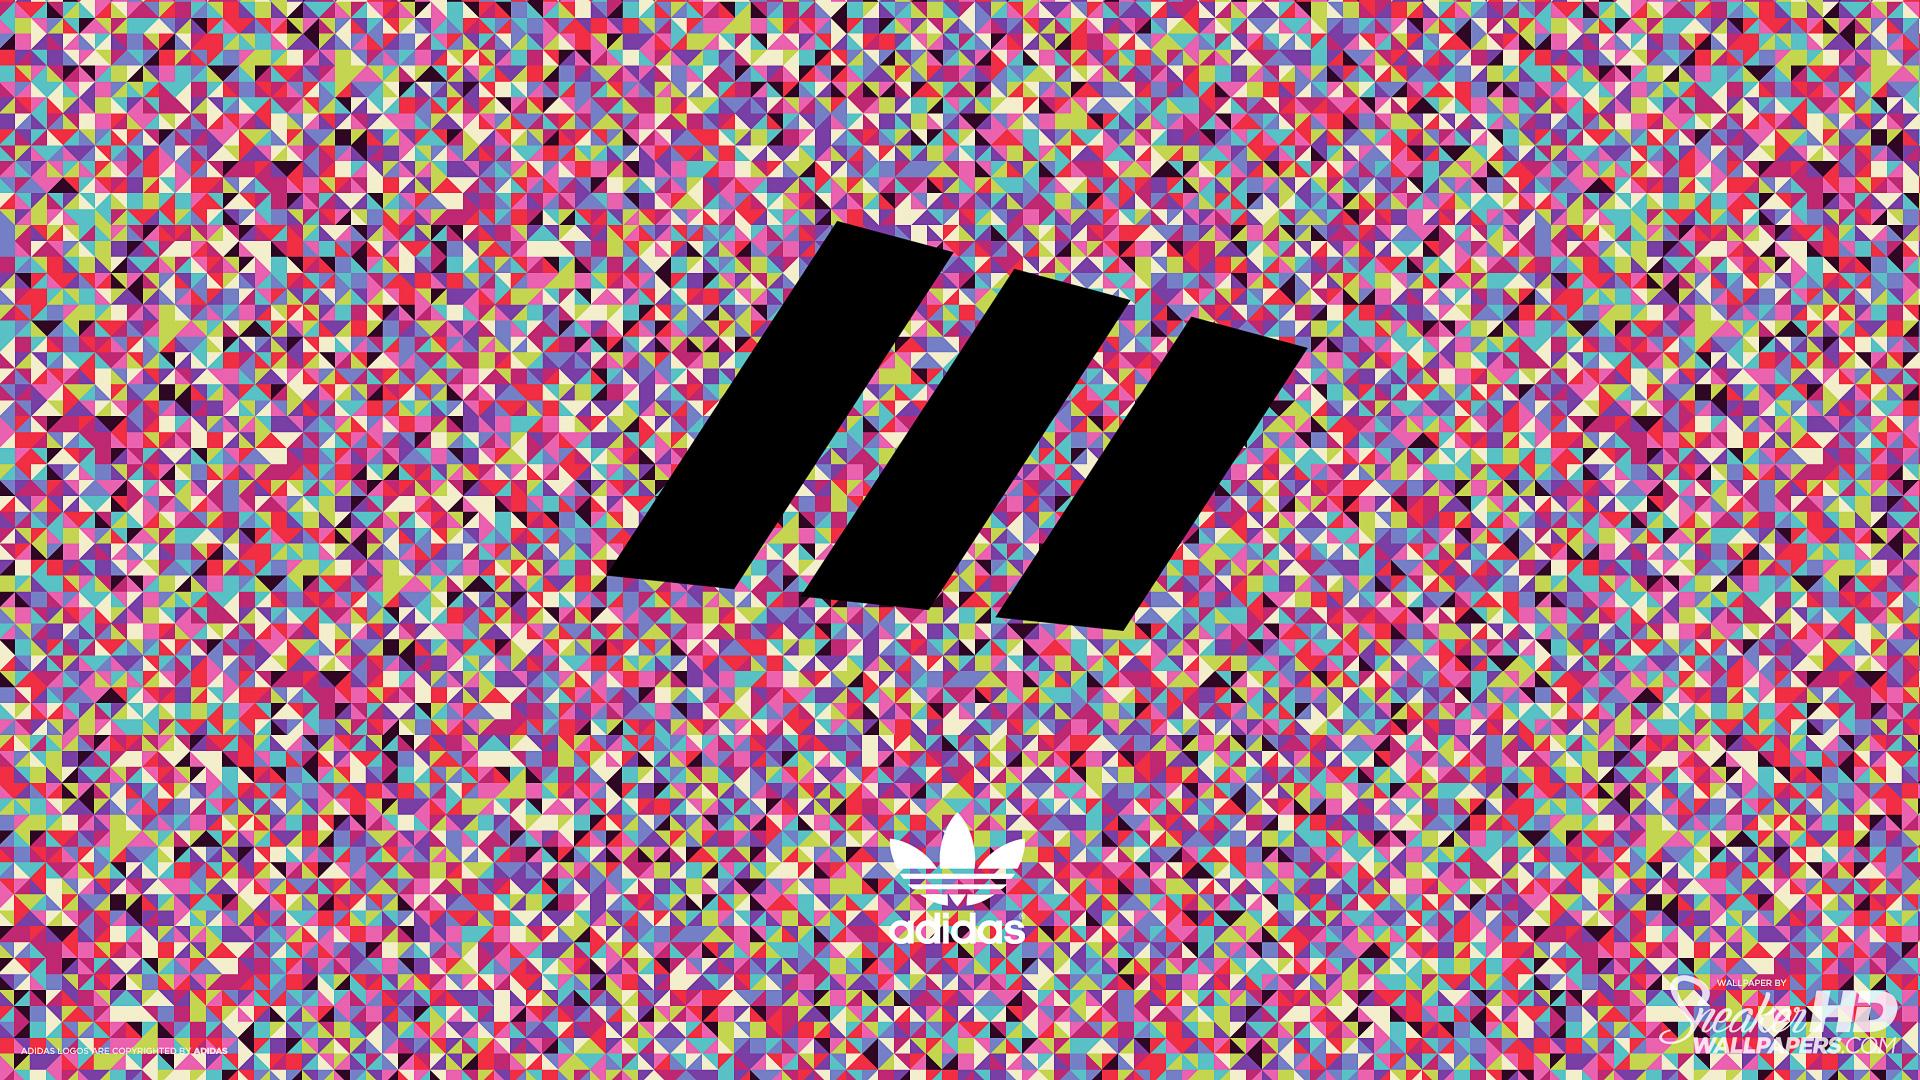 Adidas Wallpapers 1920 x 1080 - WallpaperSafari